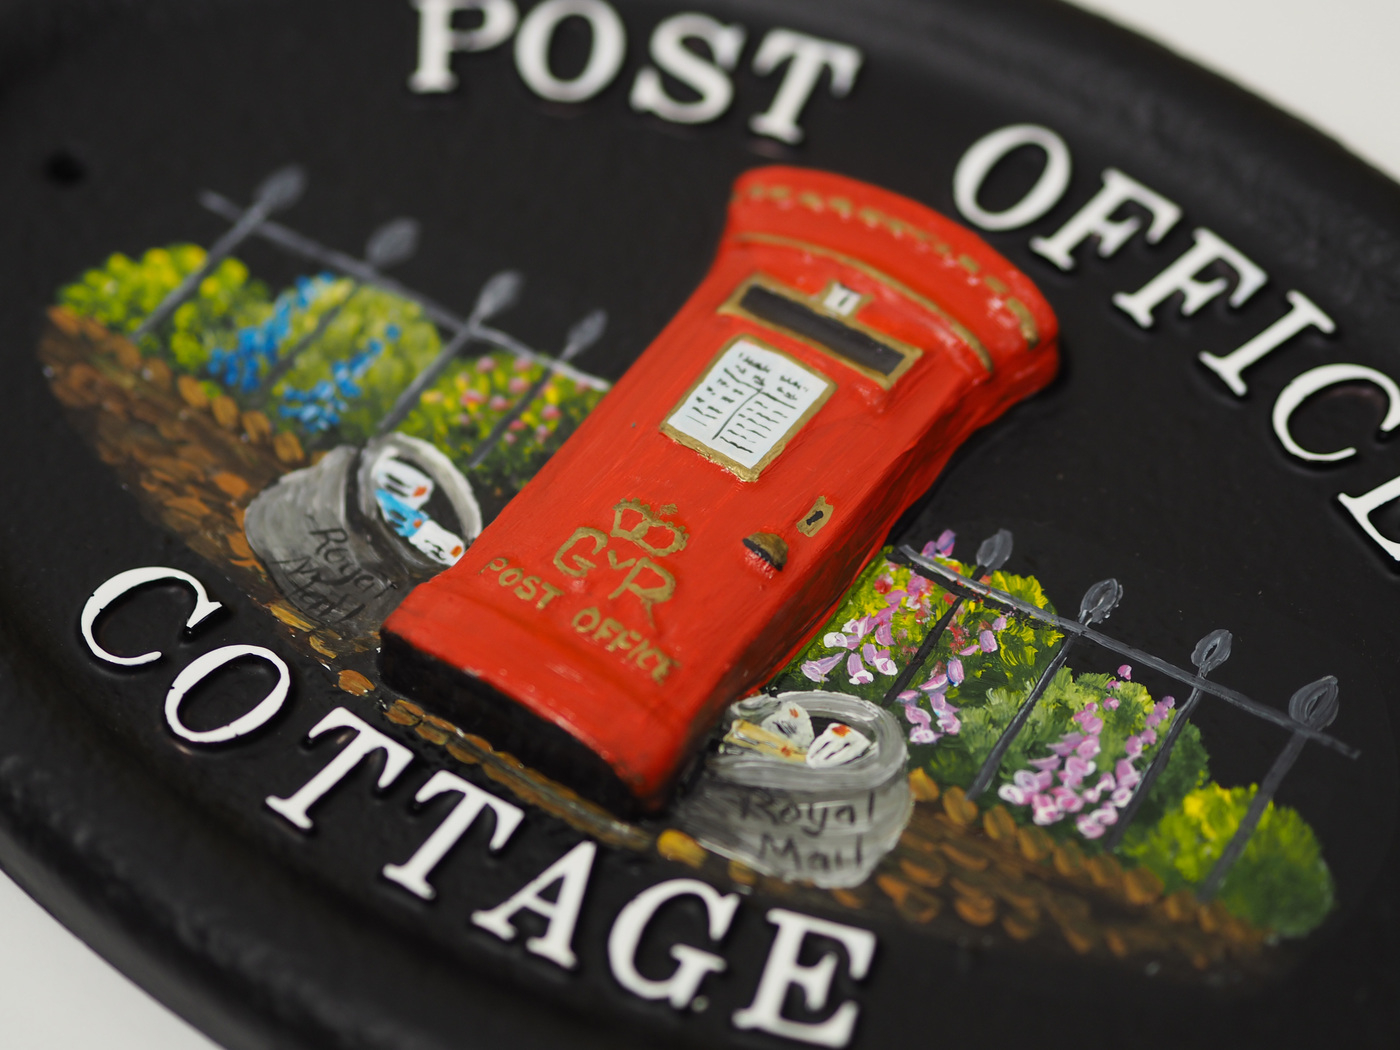 Post Box close-up. house sign